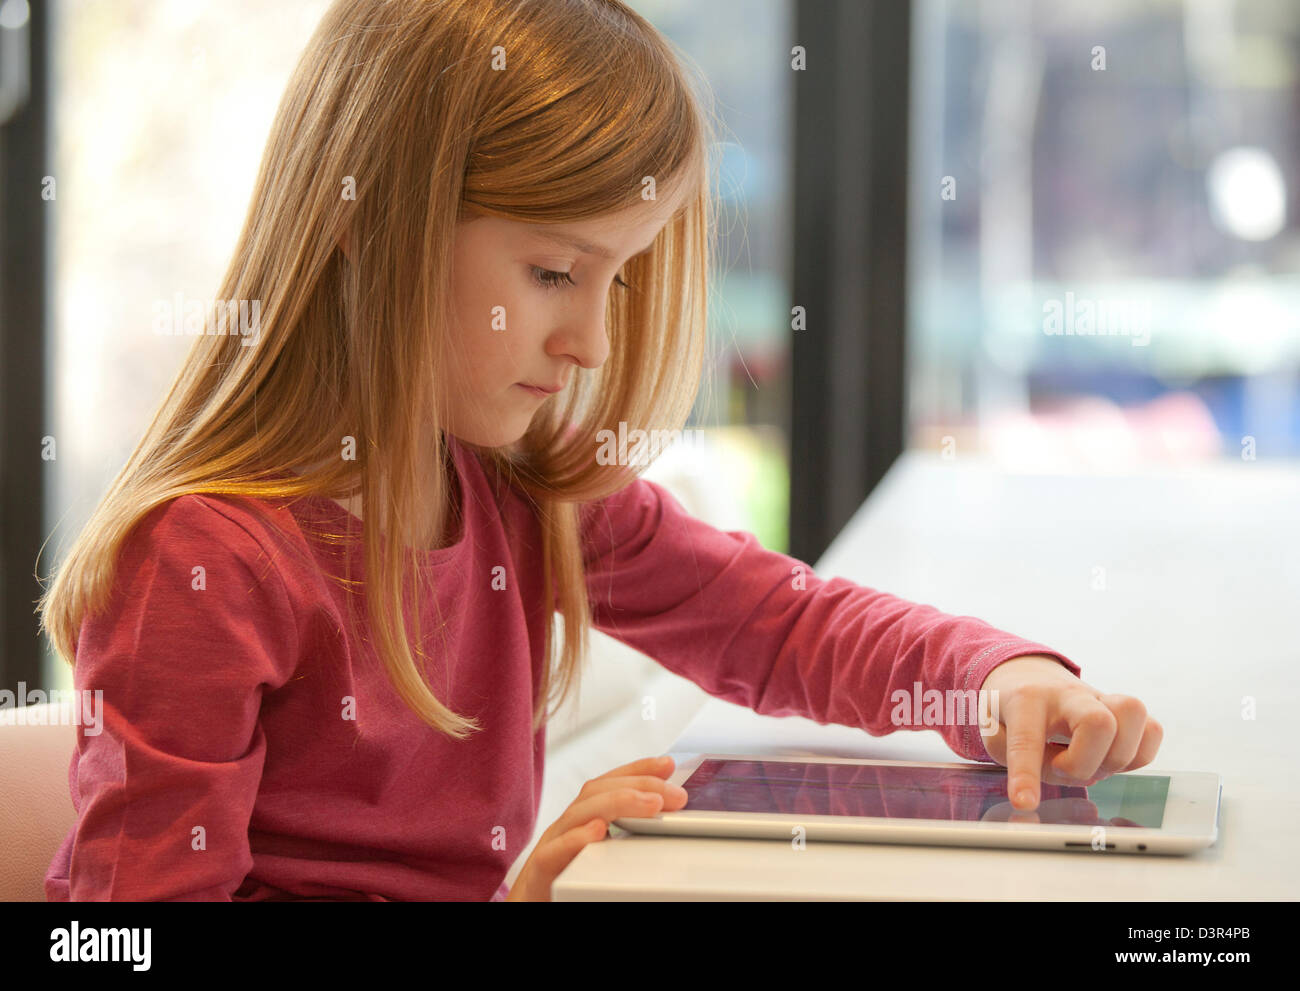 Young girl playing on an apple iPad tablet computer - Stock Image